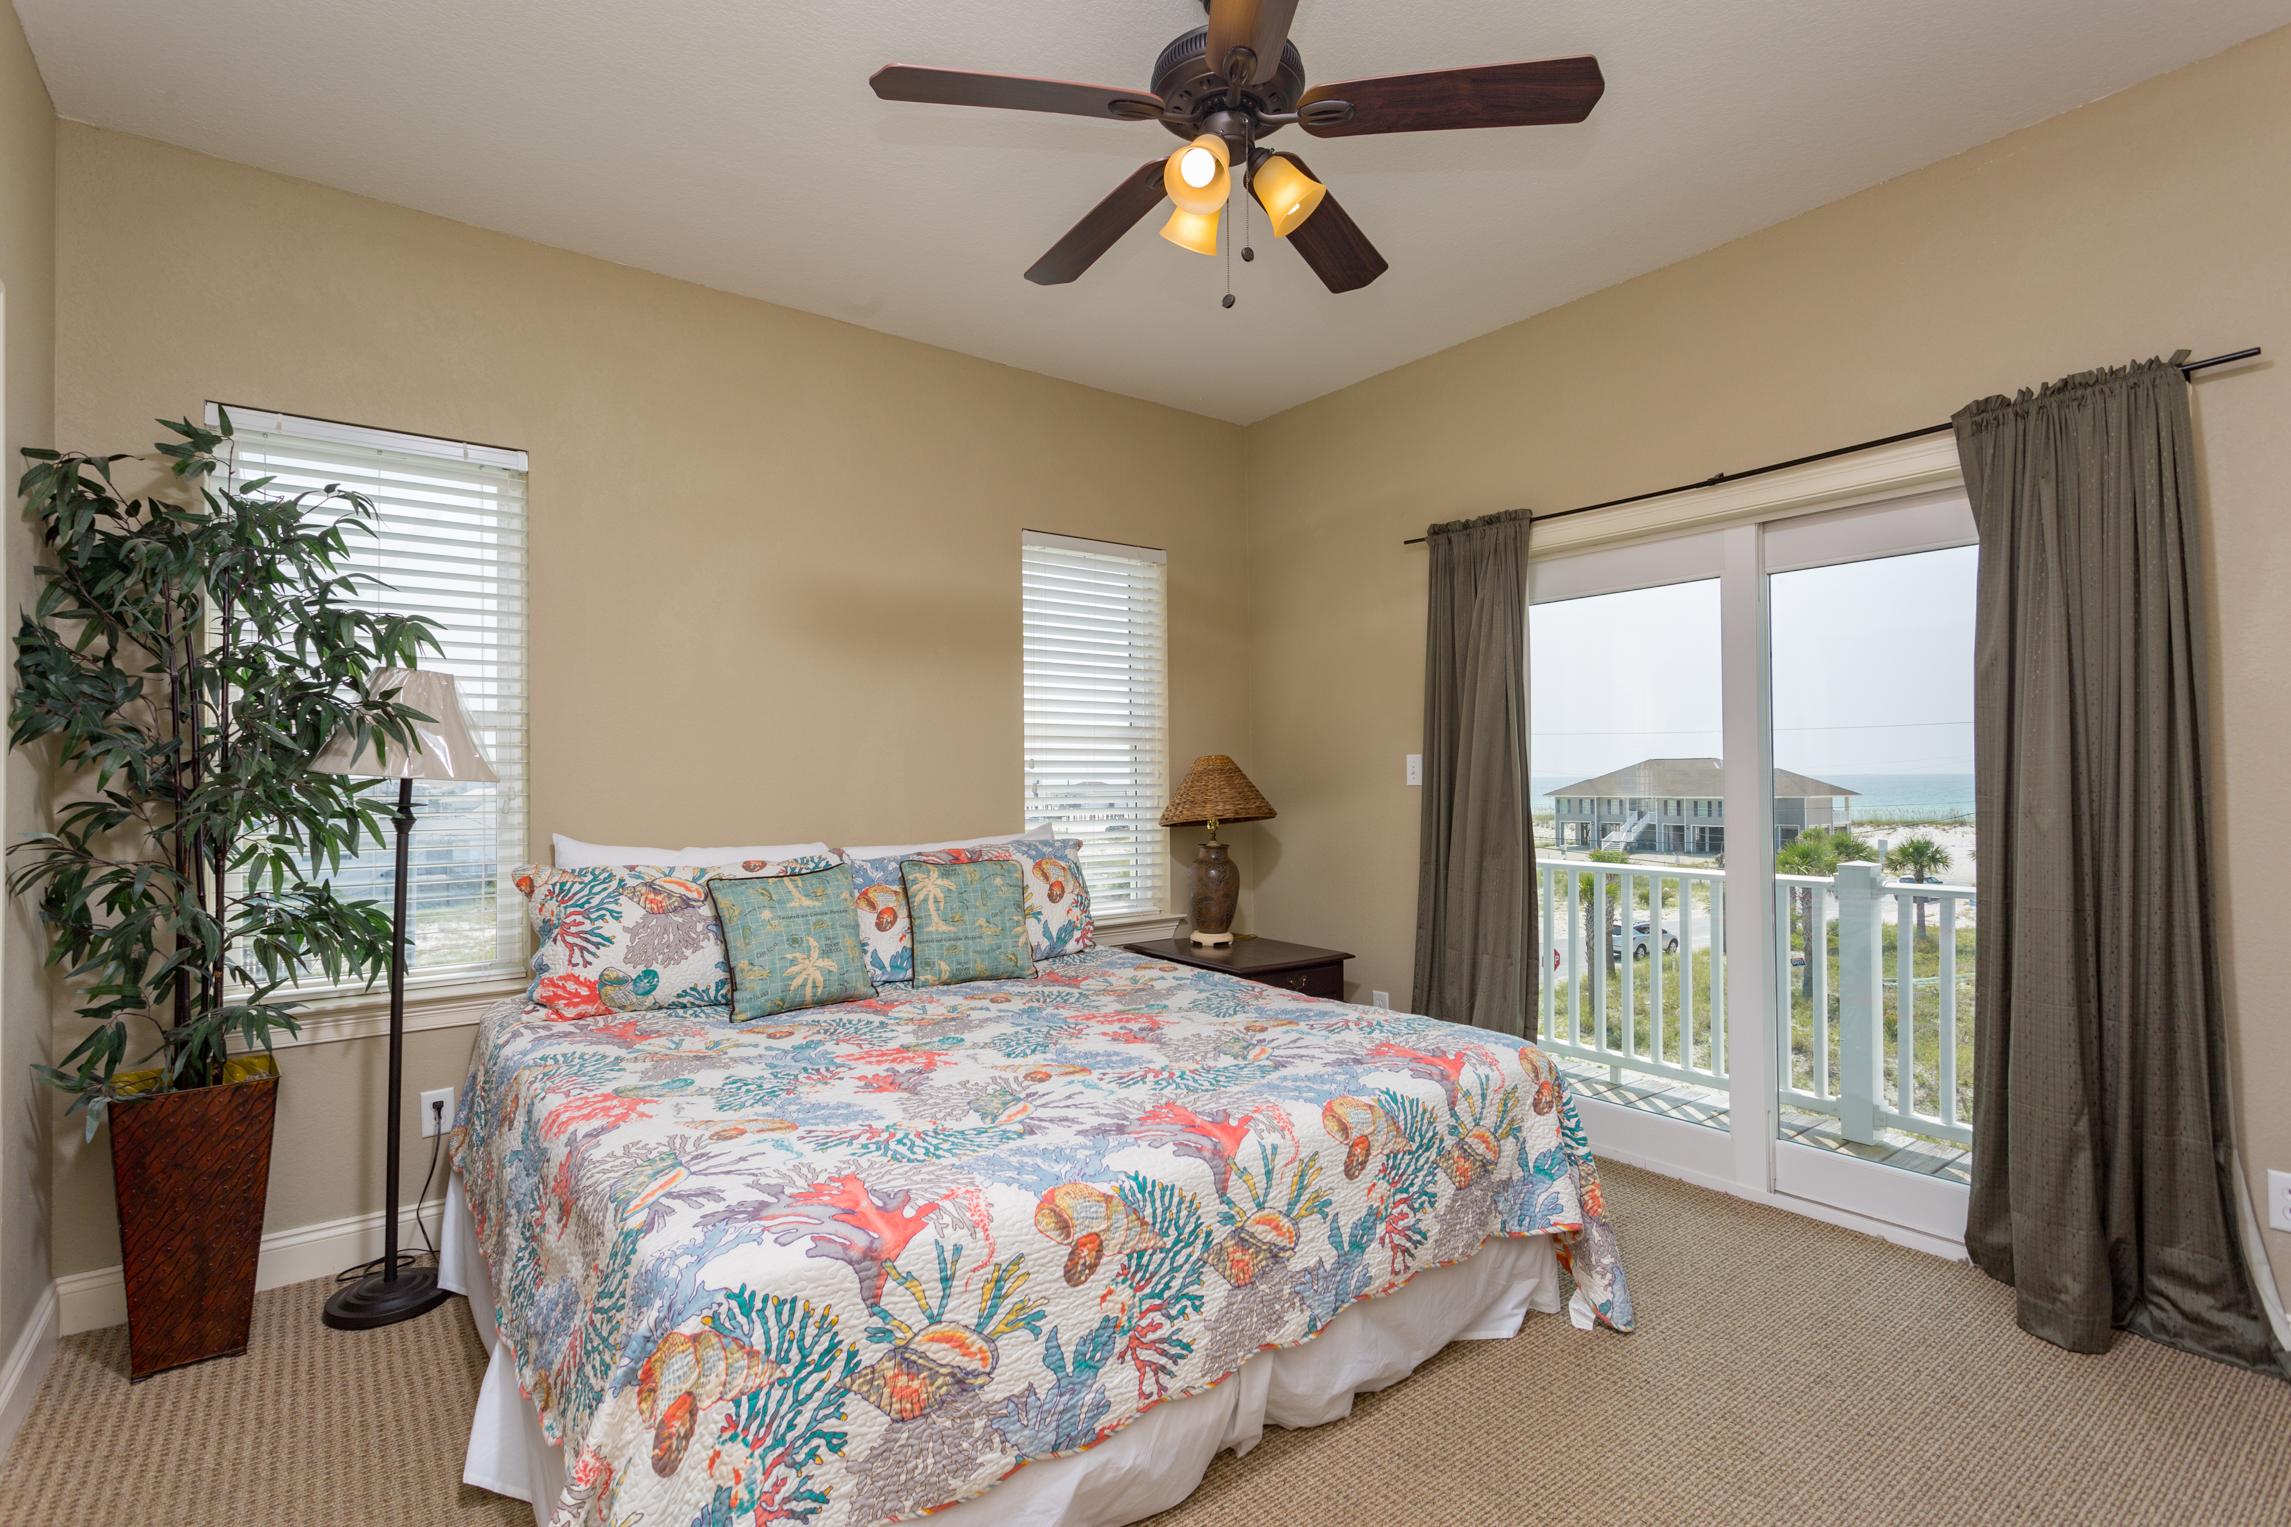 Maldonado 500 House/Cottage rental in Pensacola Beach House Rentals in Pensacola Beach Florida - #16